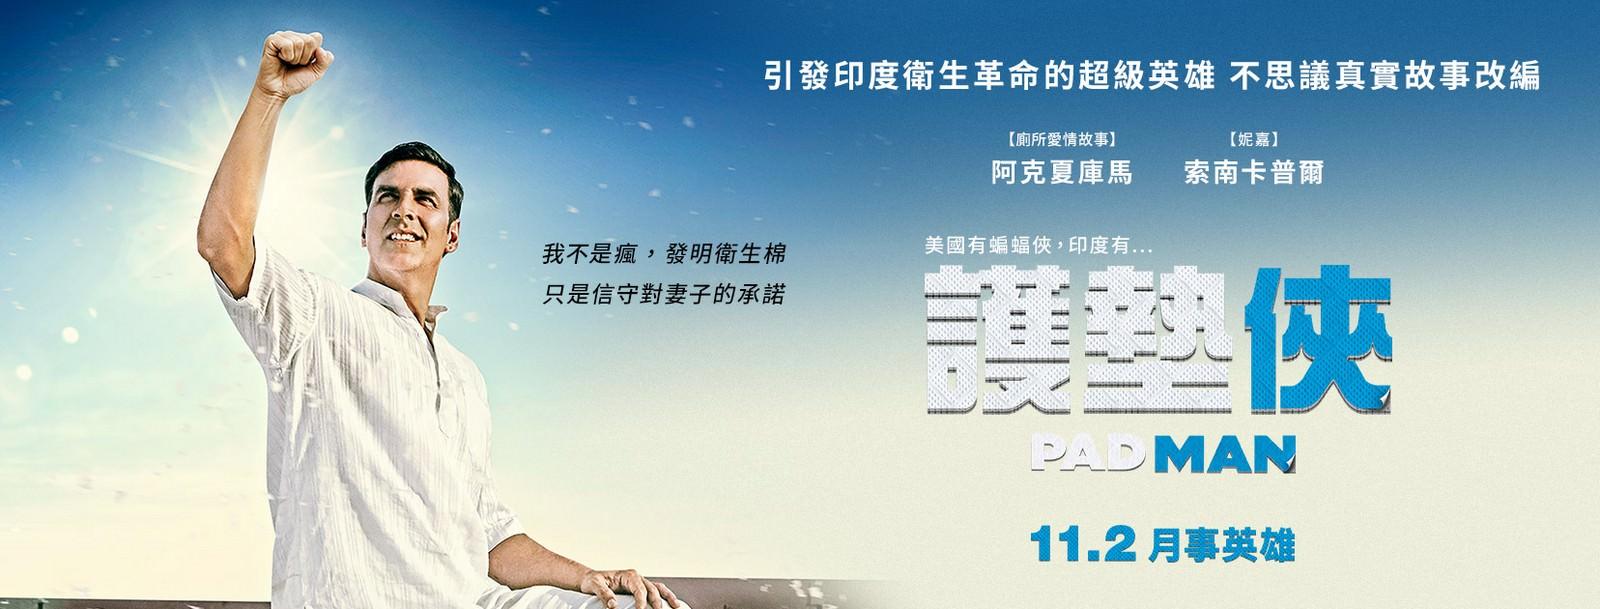 Movie, PadMan(印度, 2018年) / 護墊俠(台灣) / 印度合伙人(中國), 電影海報, 台灣, 橫板